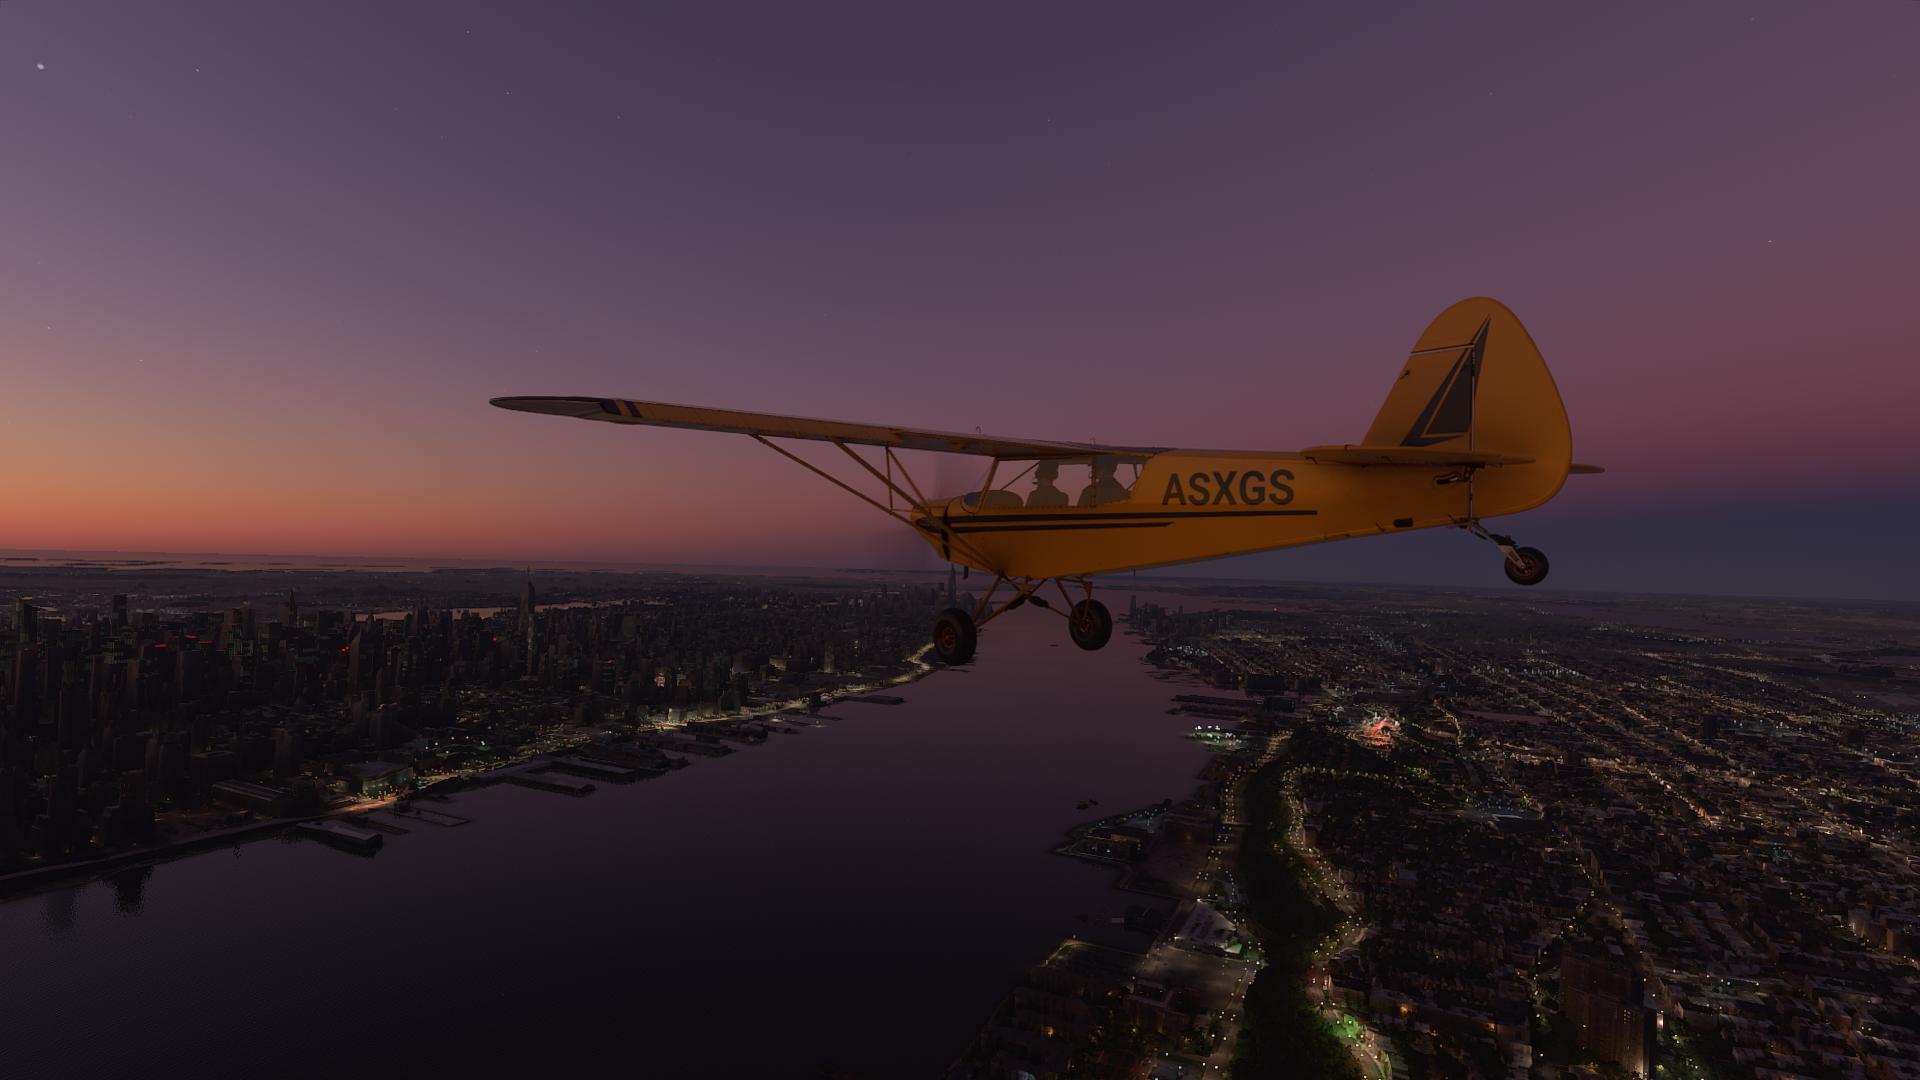 A yellow plane flies in dusk over New York City in Microsoft Flight Simulator